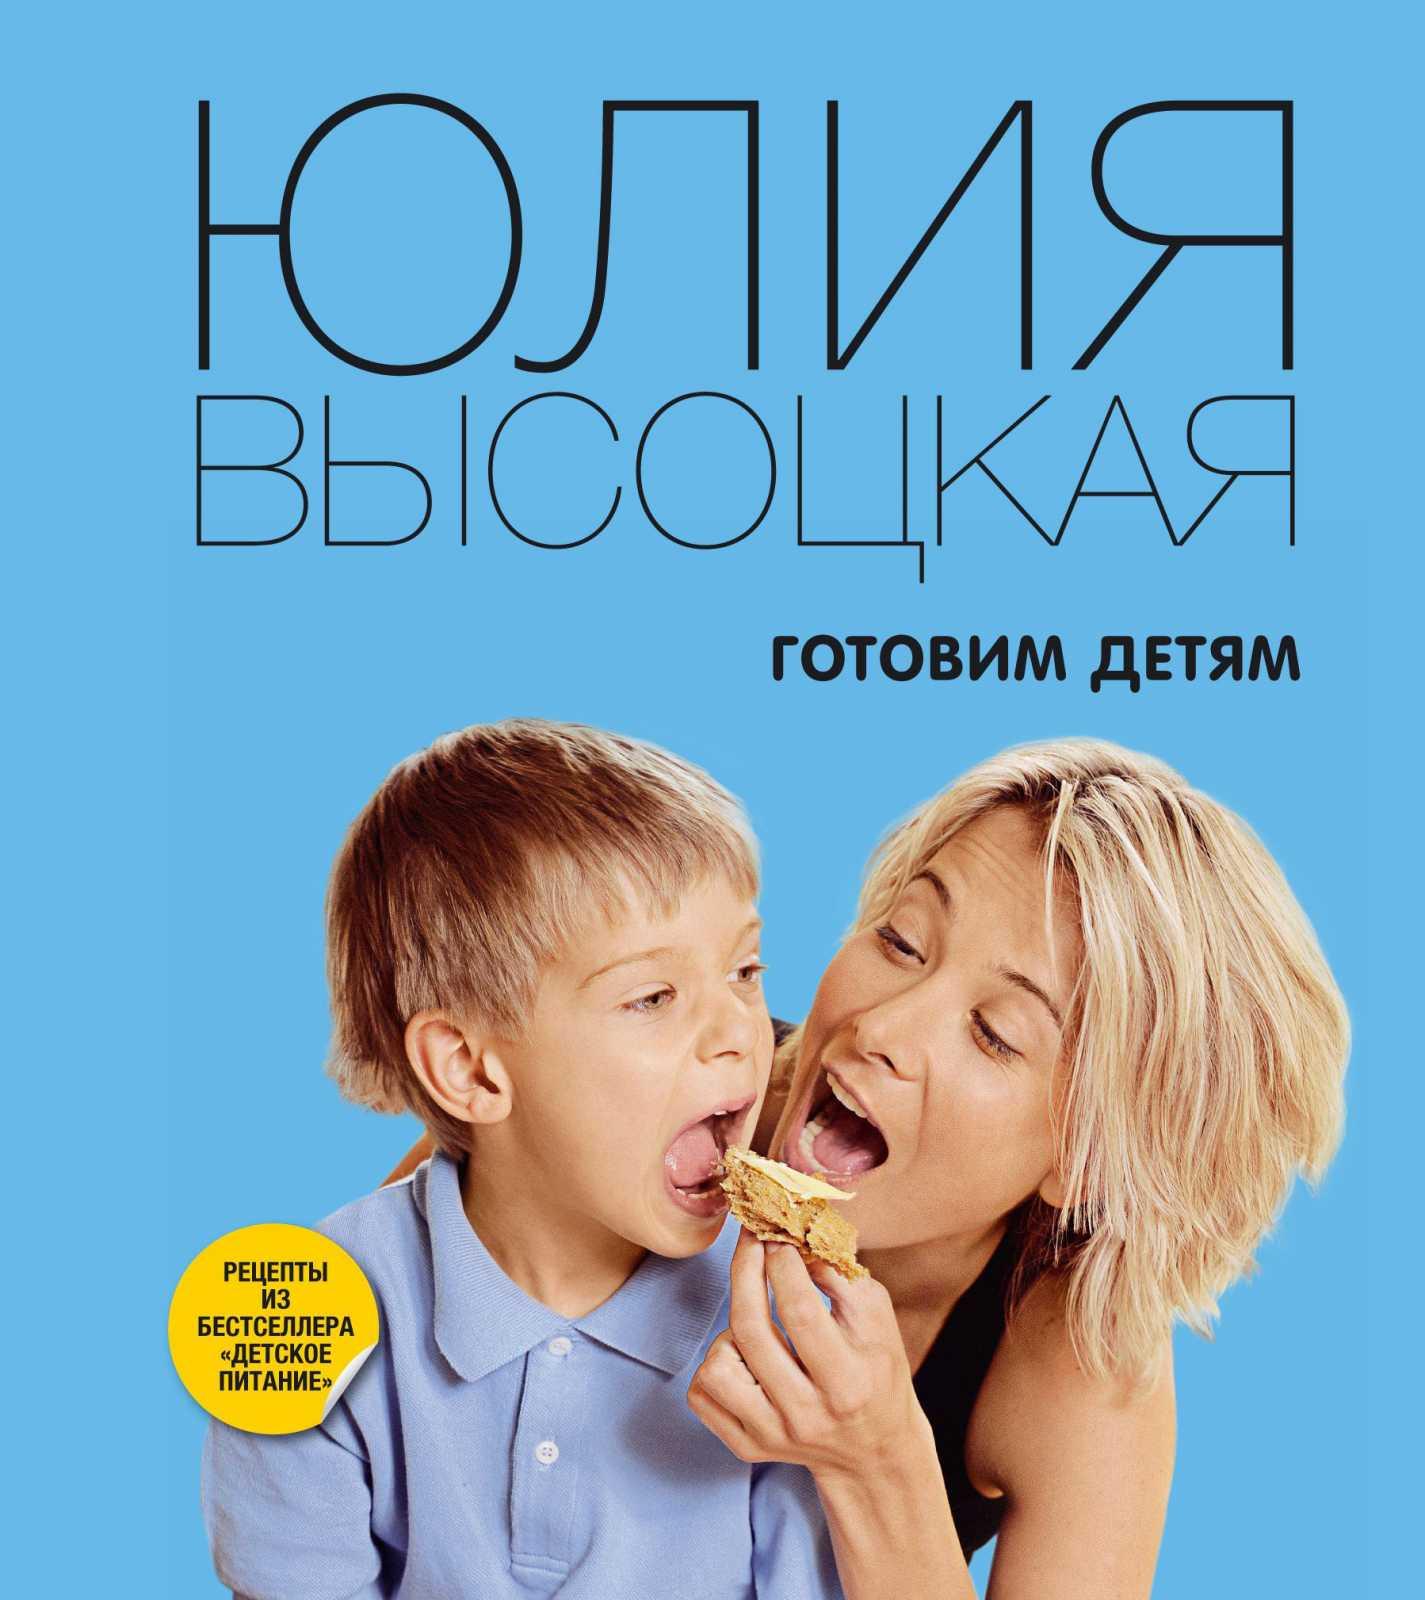 Онлайн каталог PROMENU: Книга «Готовим детям» Books Books UW3